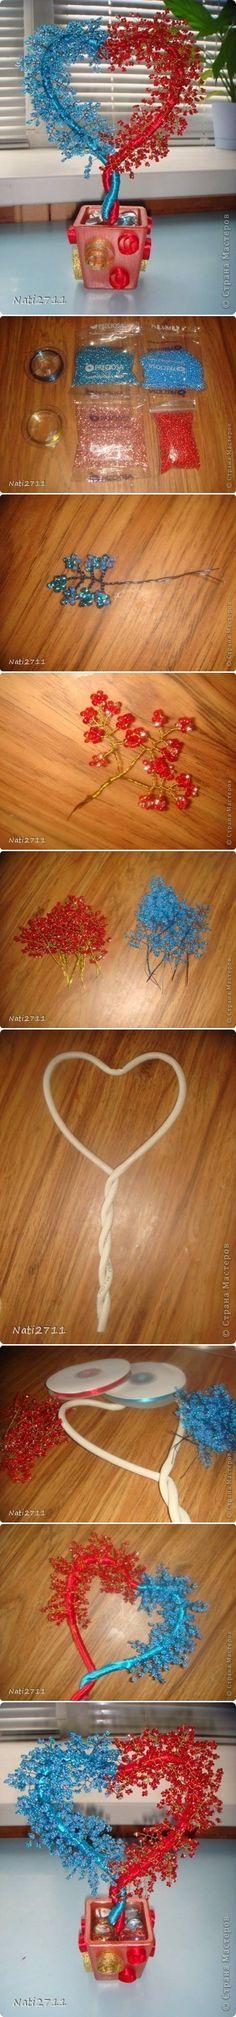 DIY Tree of Love